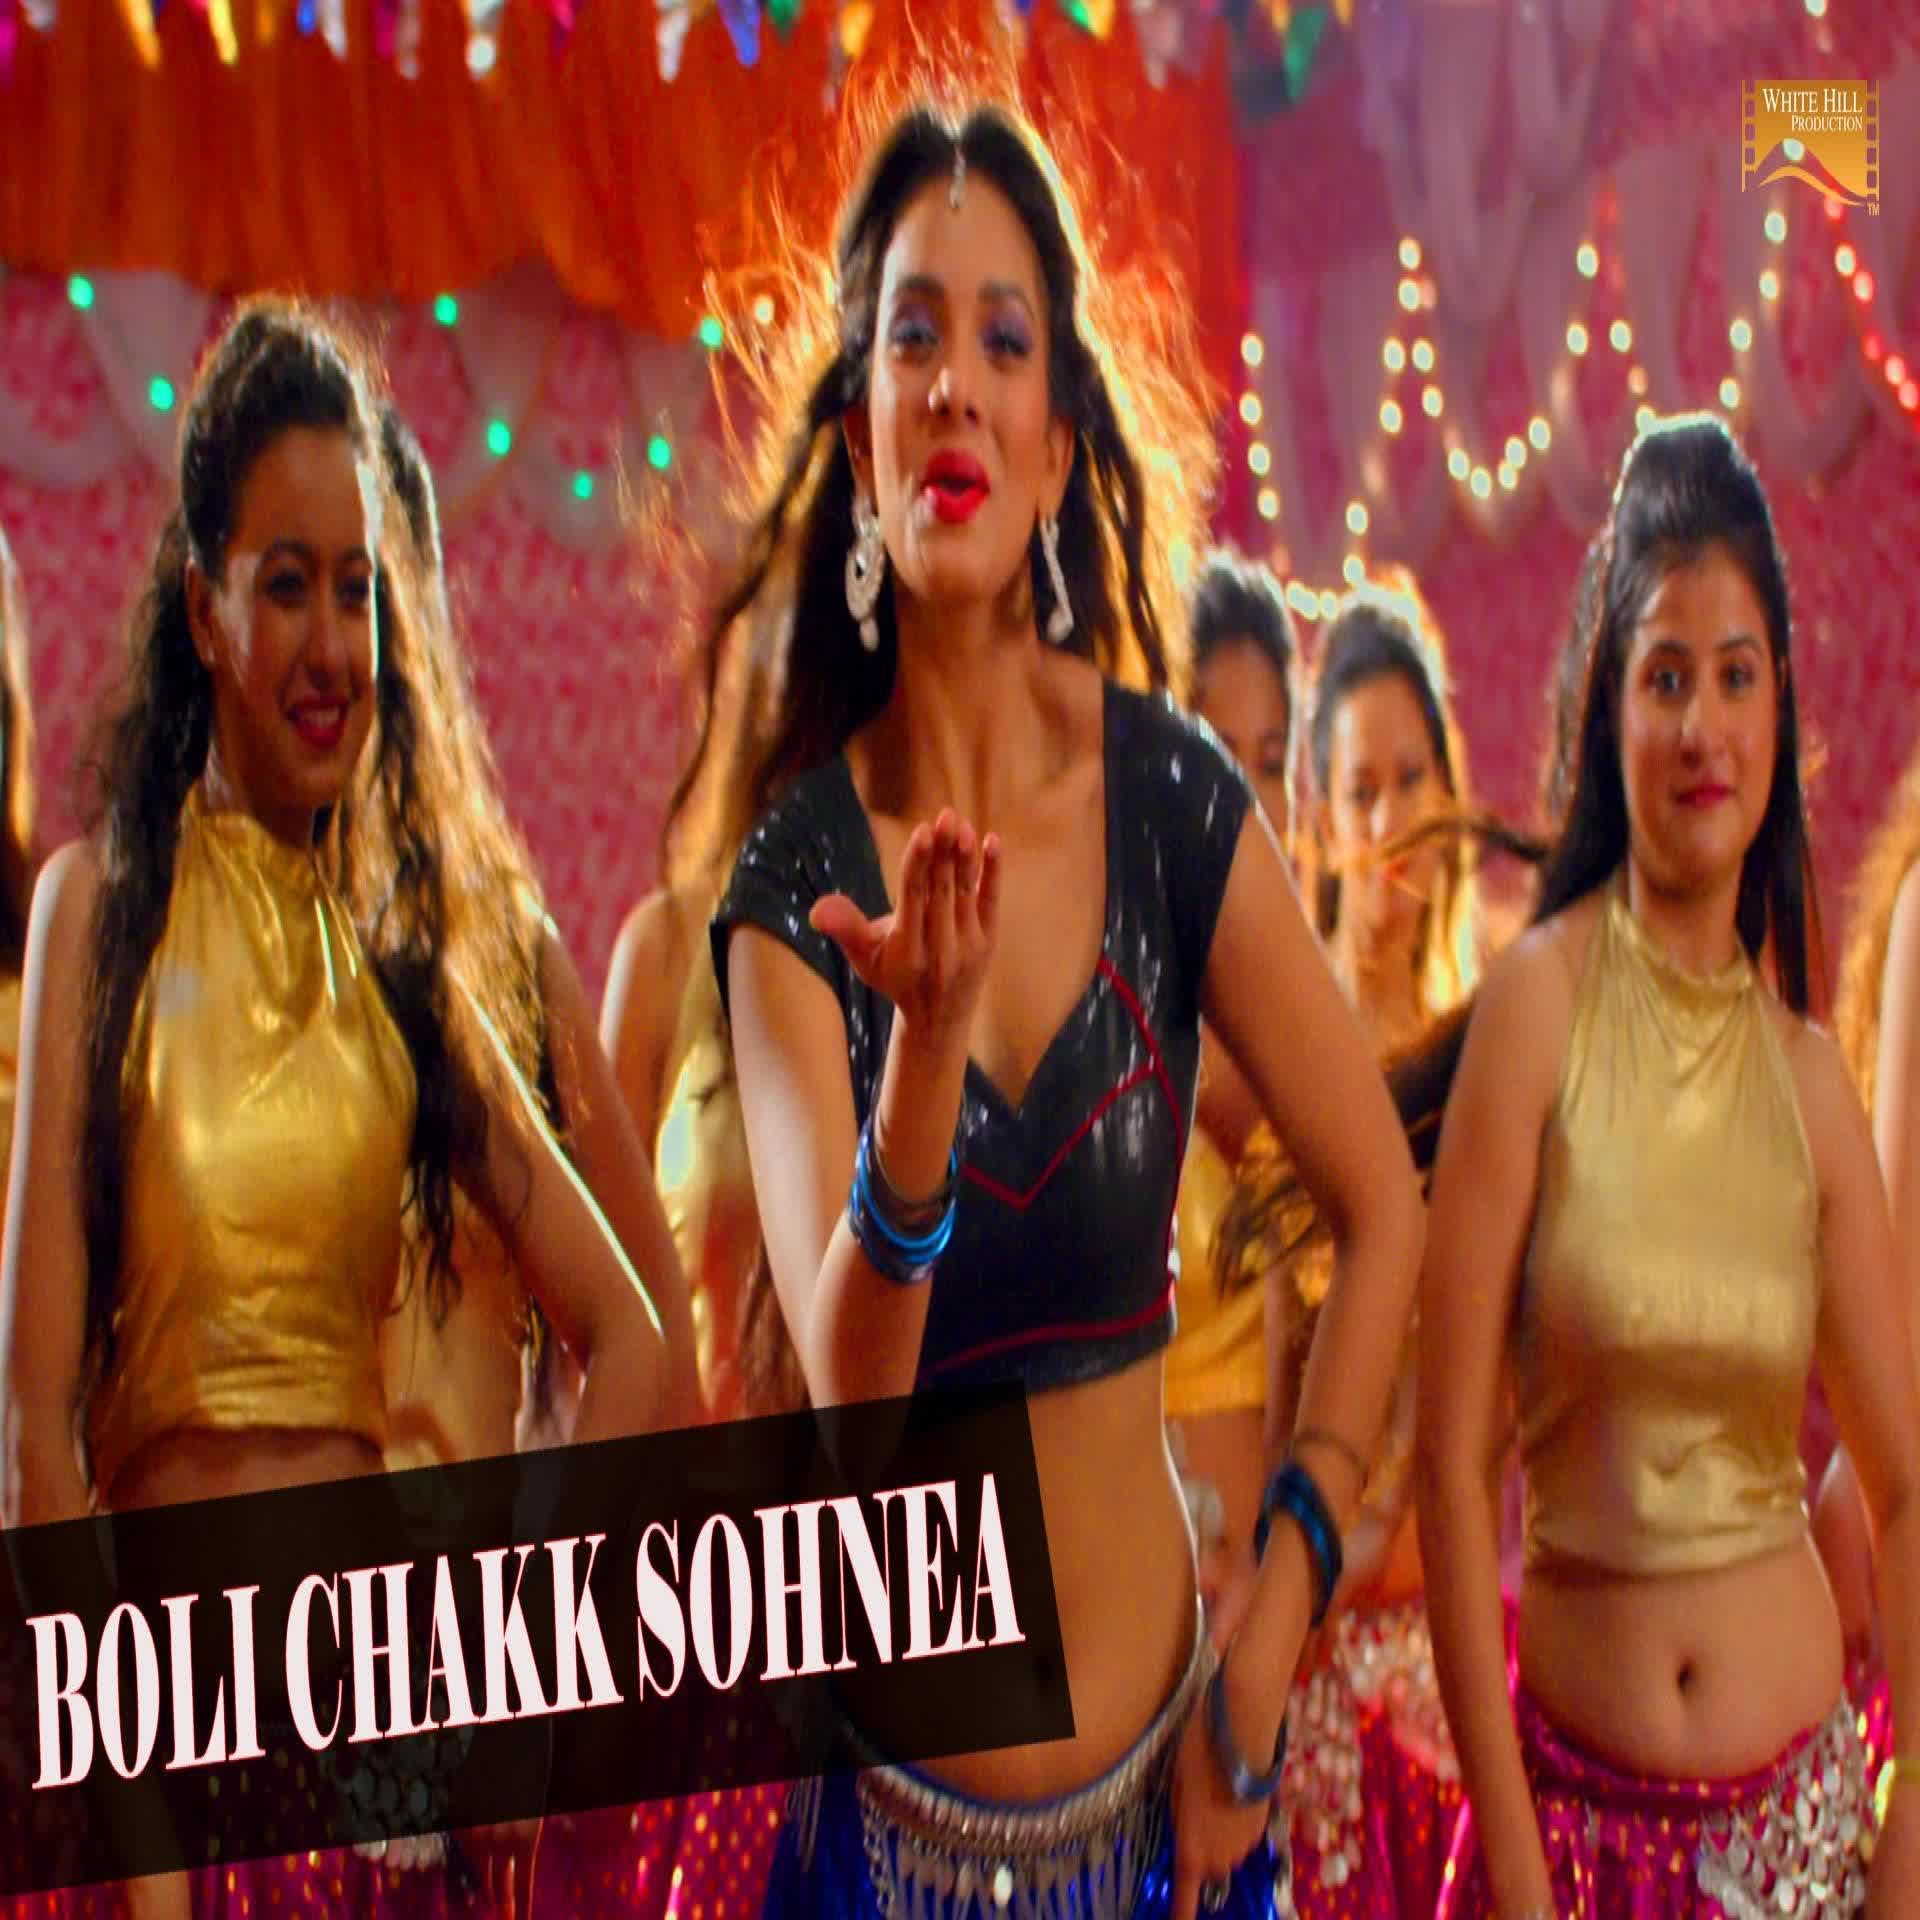 Boli Chakk Sohnea Miss Pooja Mp3 Song